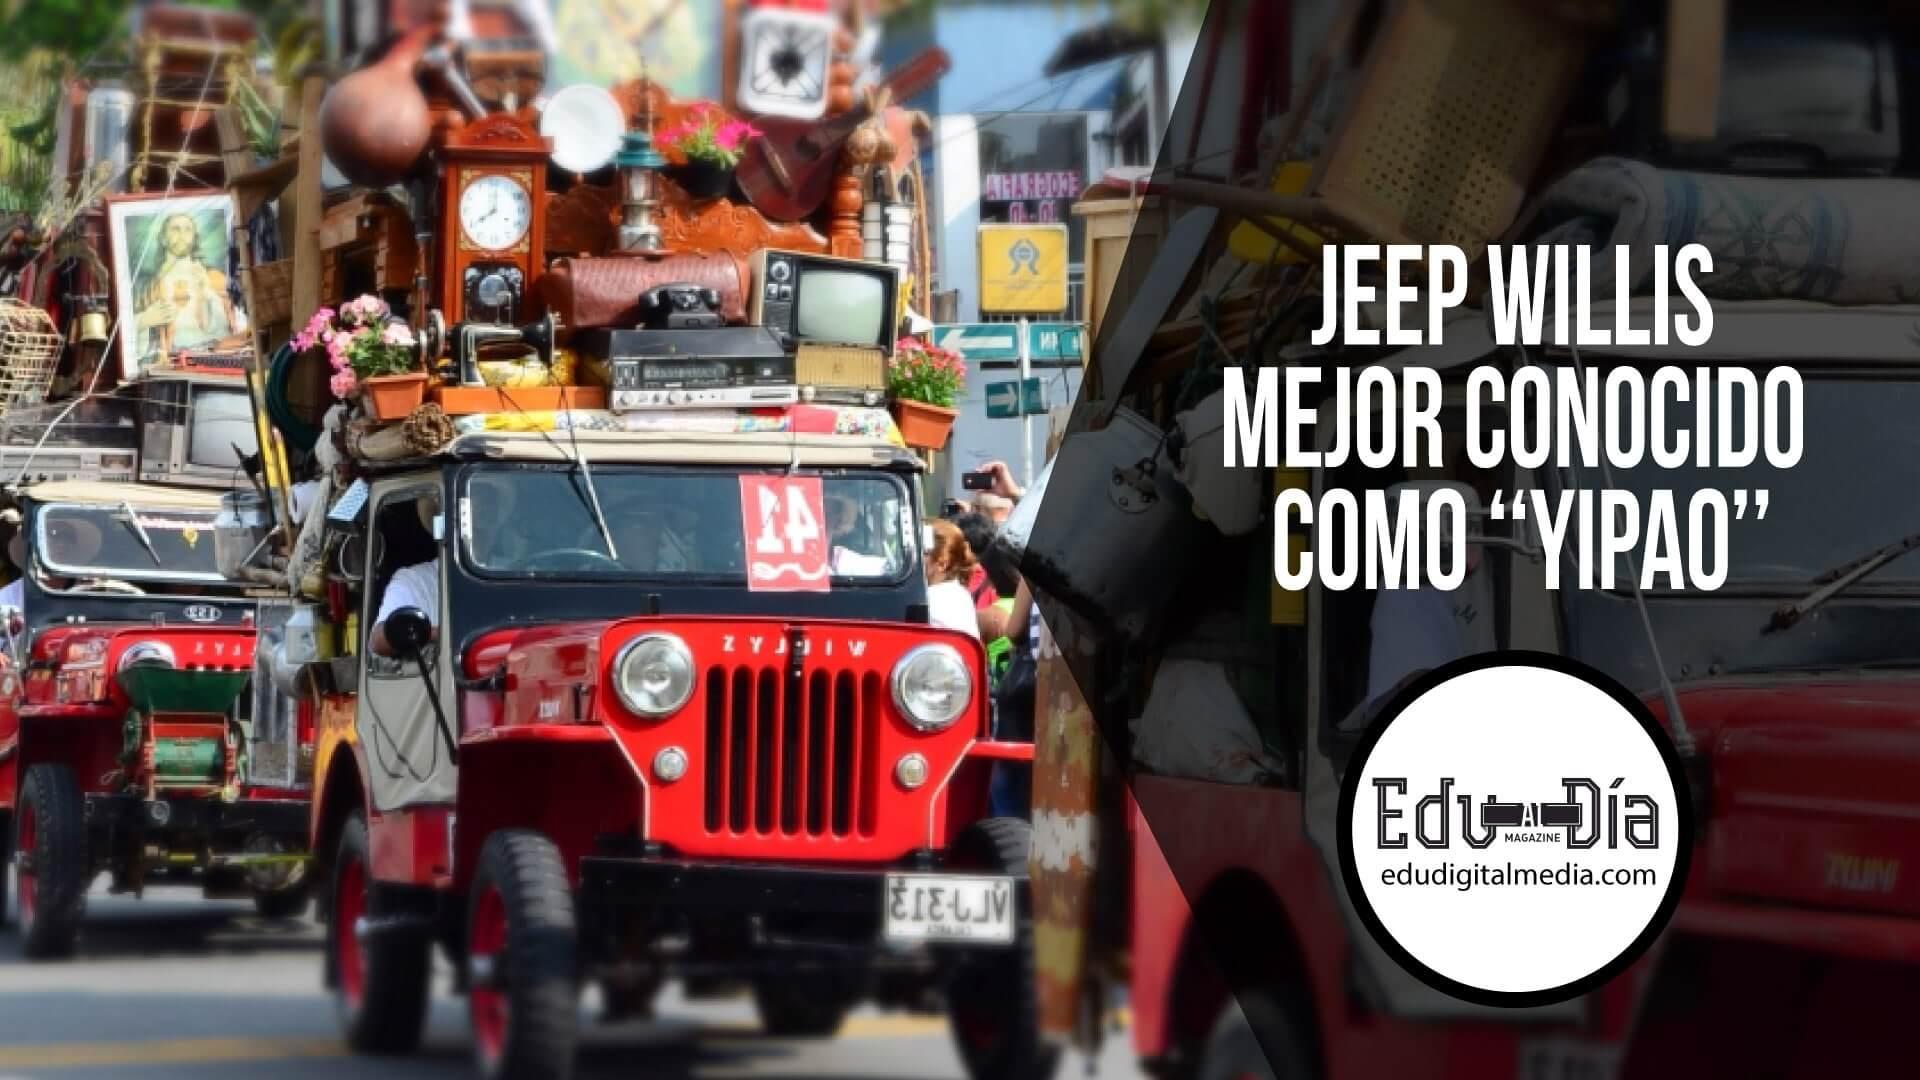 jeep-willis-conocido-yipao-edudigital